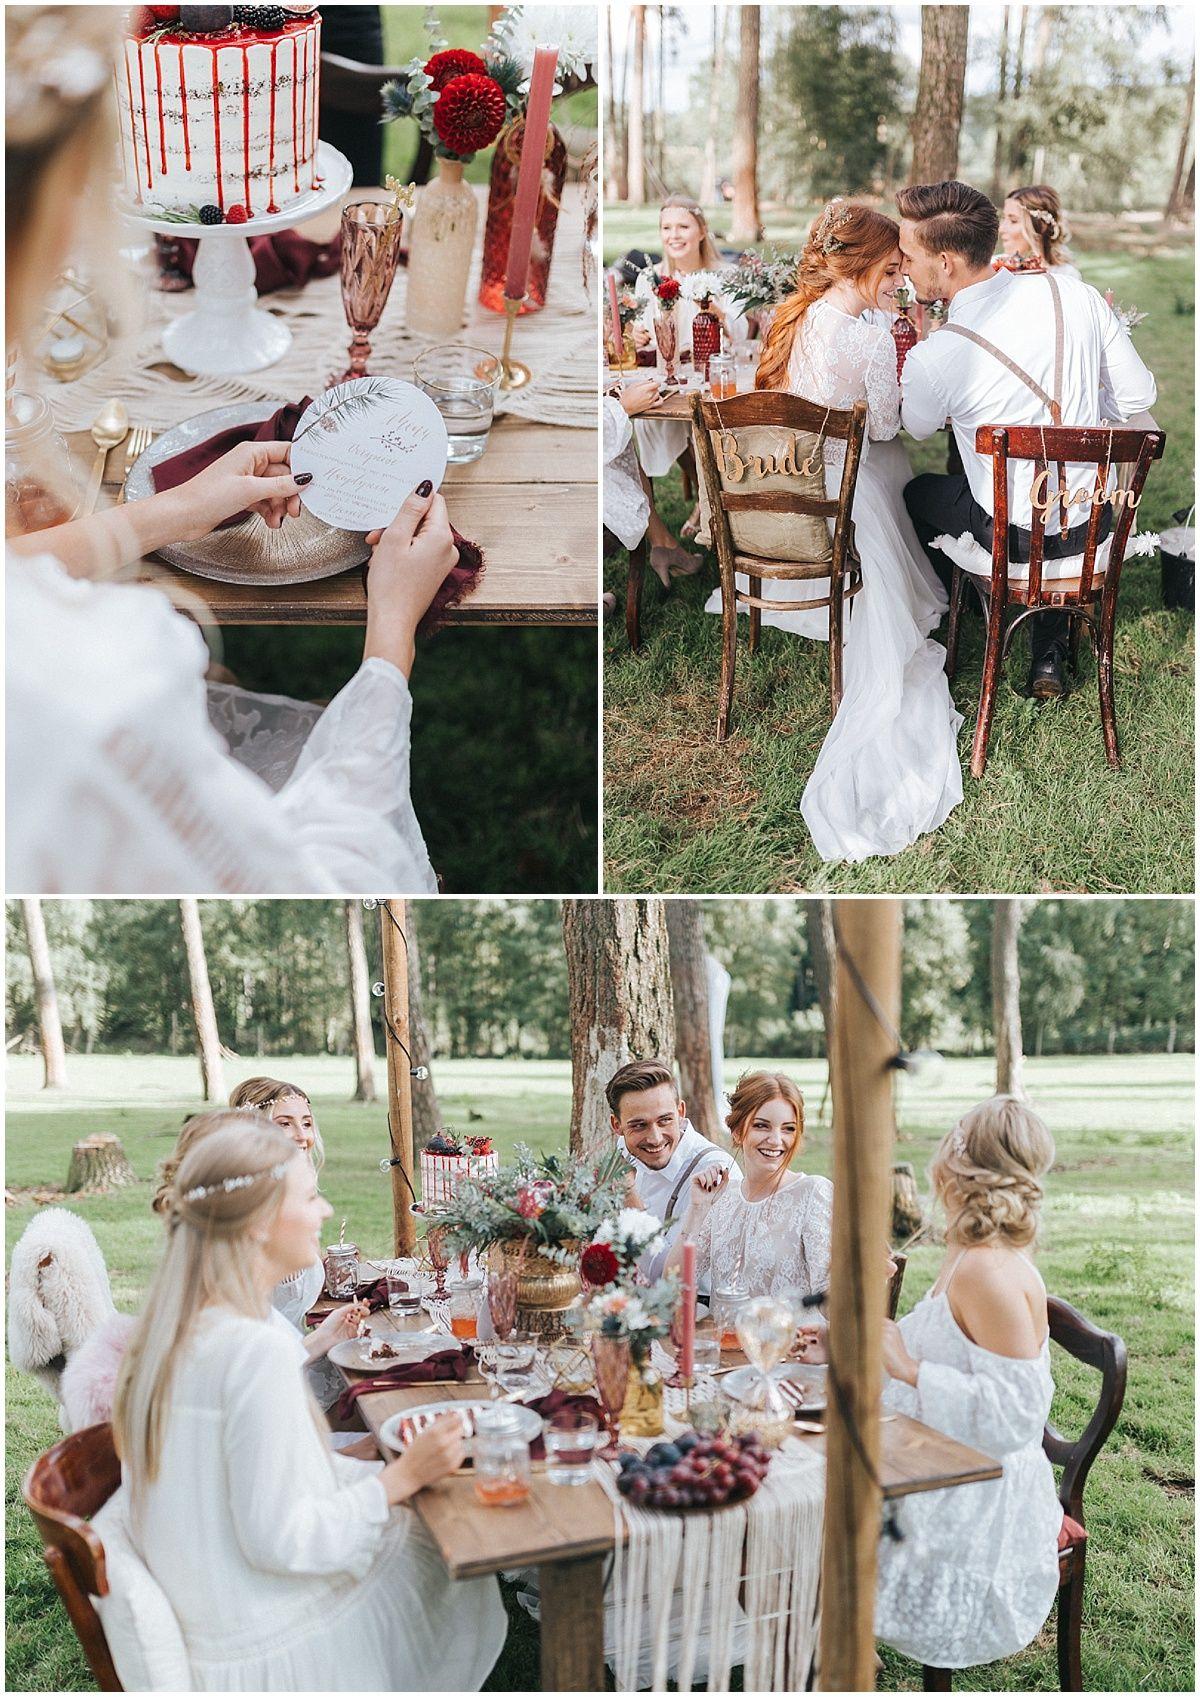 marryMAG: Boho-Hochzeit im Wald - Outdoor-Location